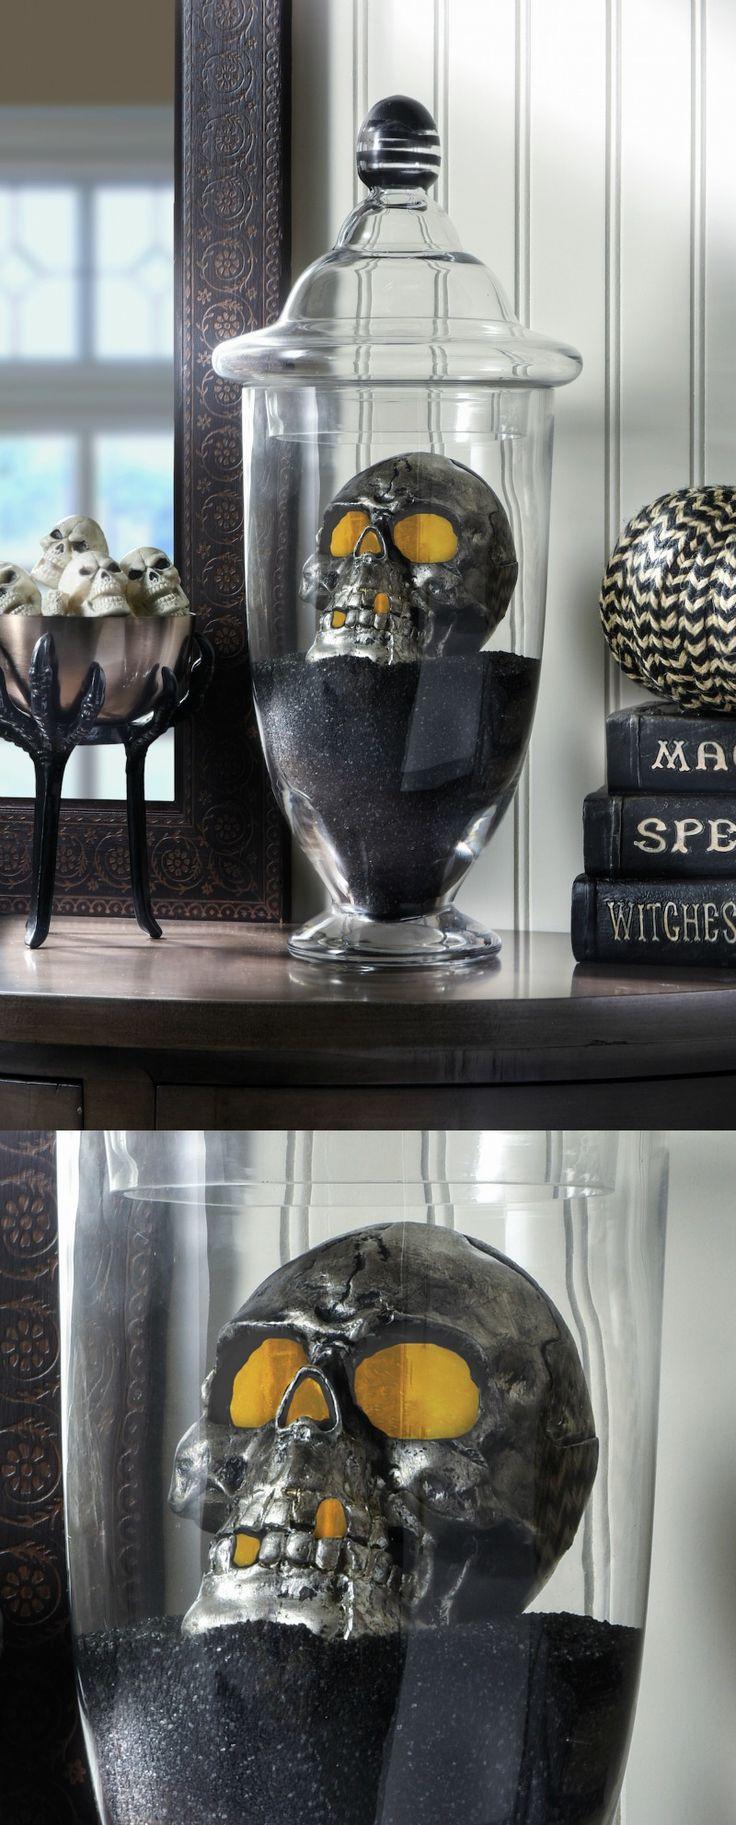 Diy halloween skull decorations - Diy Halloween Spooky Skull Display